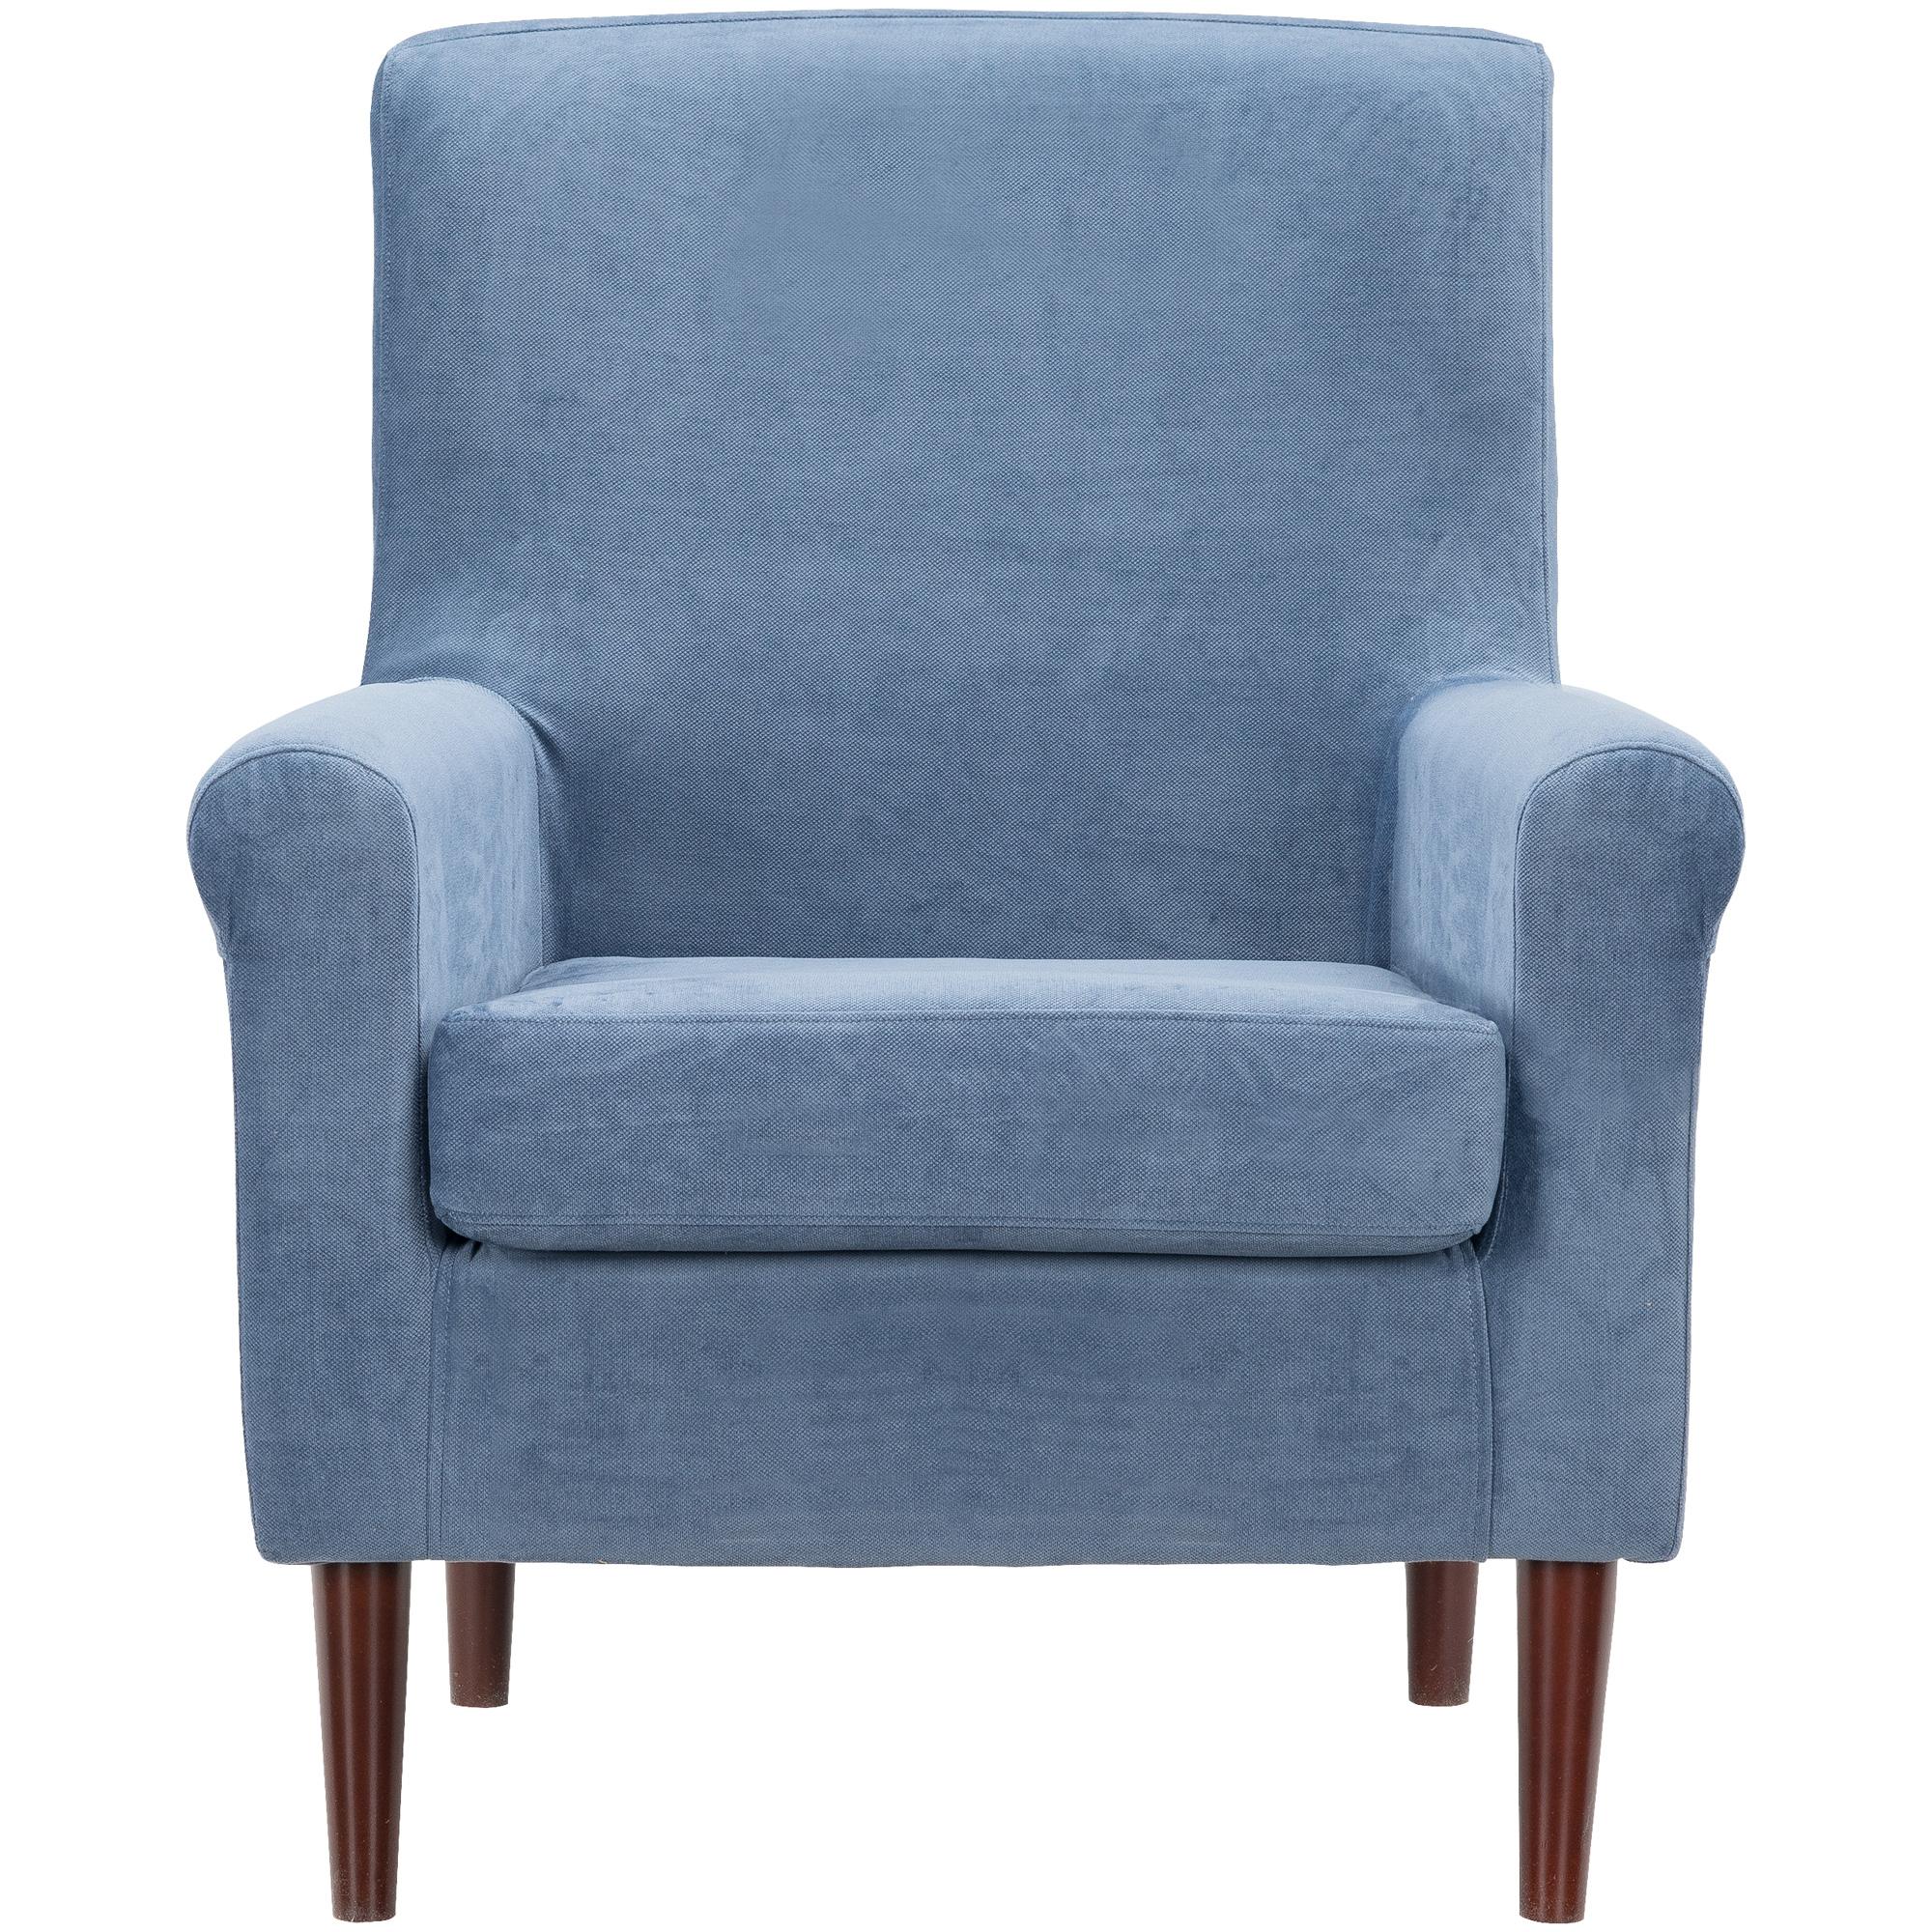 Overman | Ellis Navy Accent Chair